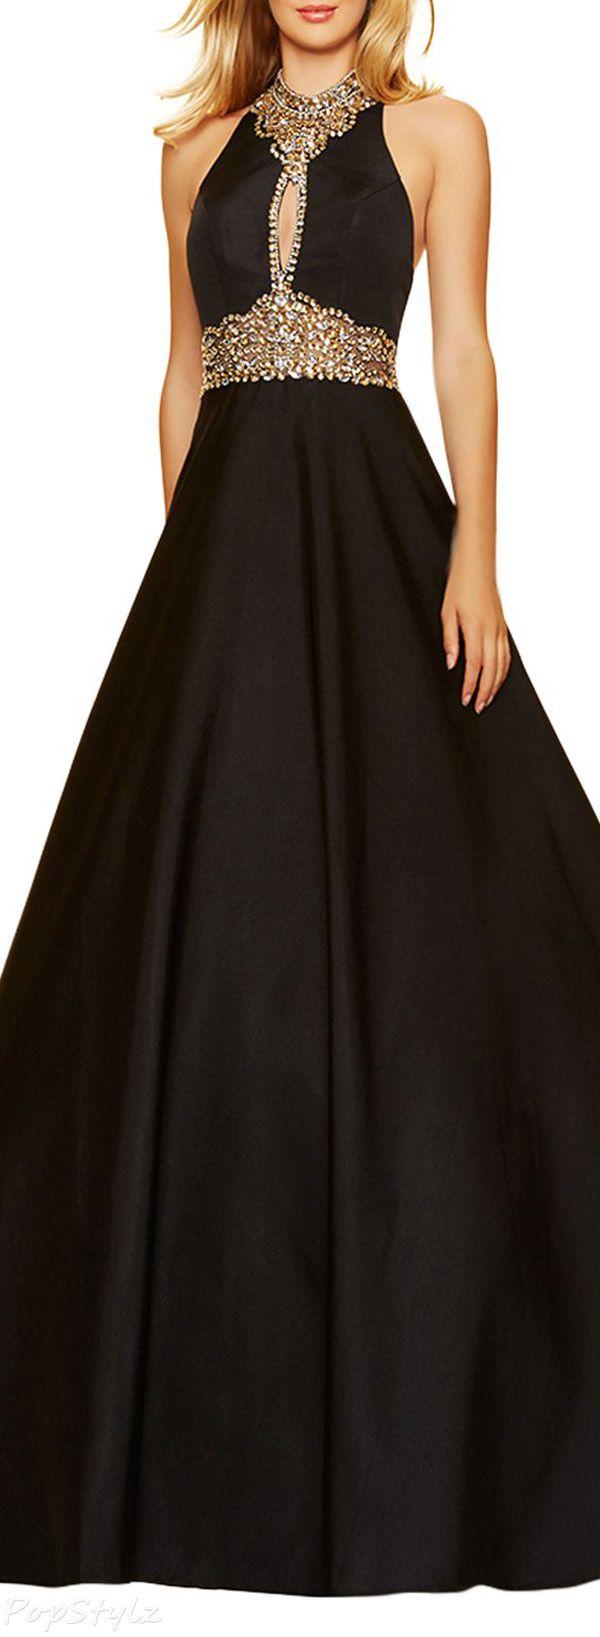 Lovingdress high neck satin u rhinestones evening gown elegant